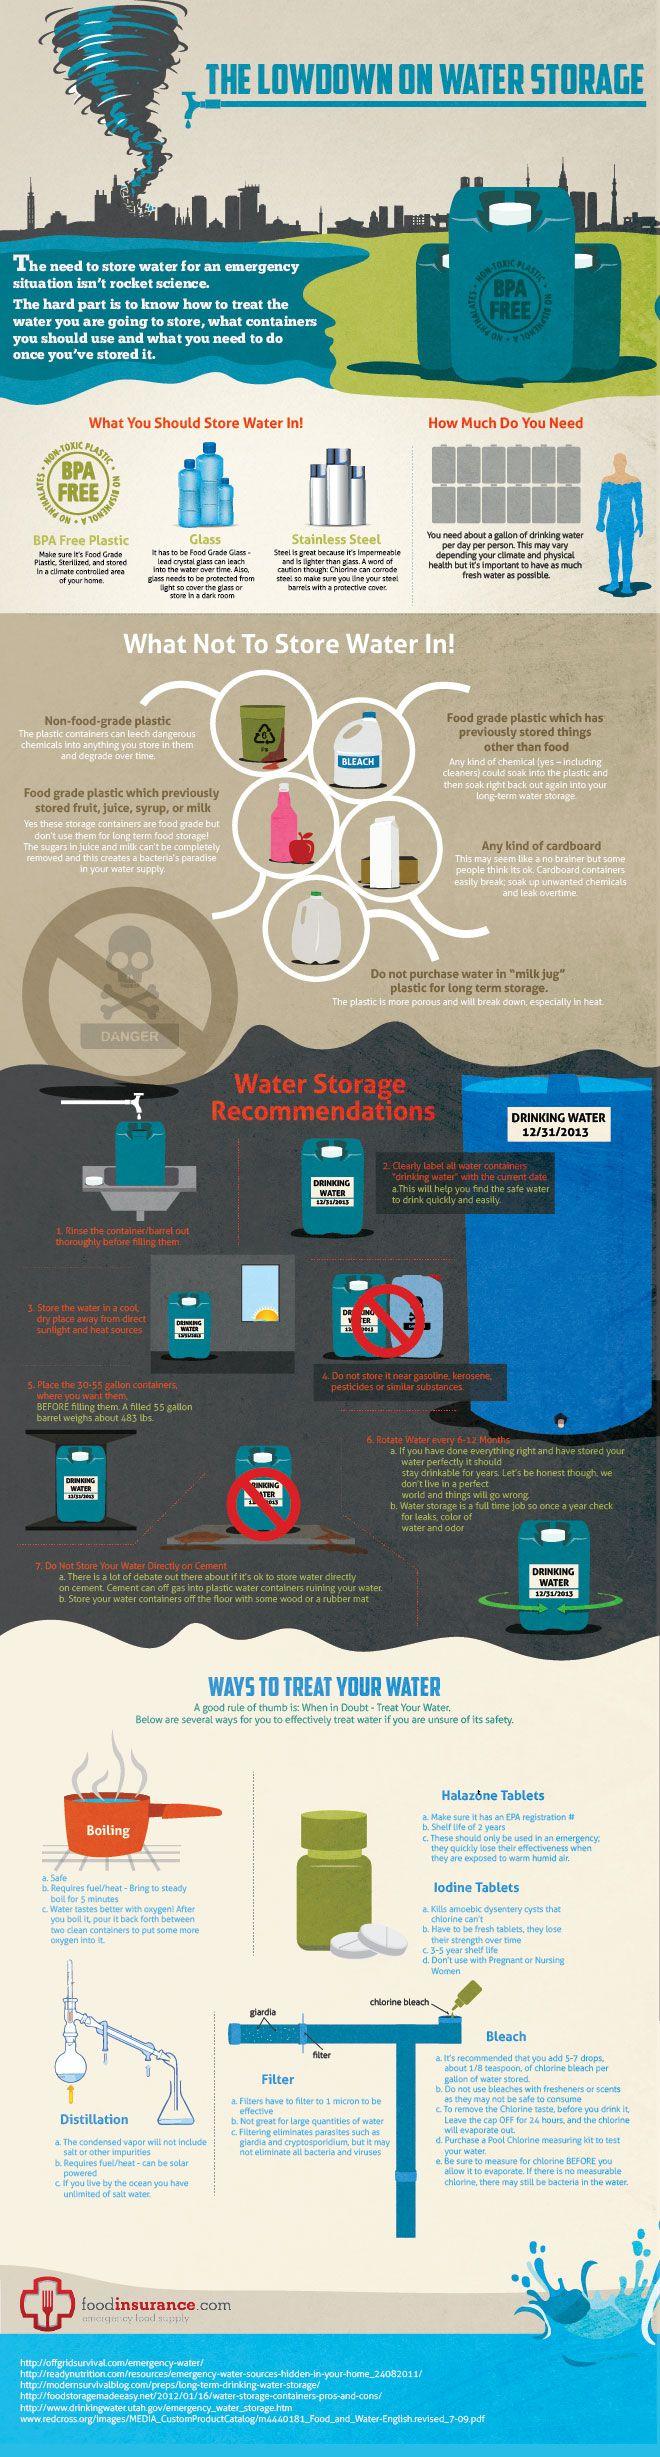 Lowdown on Water Storage Infographic